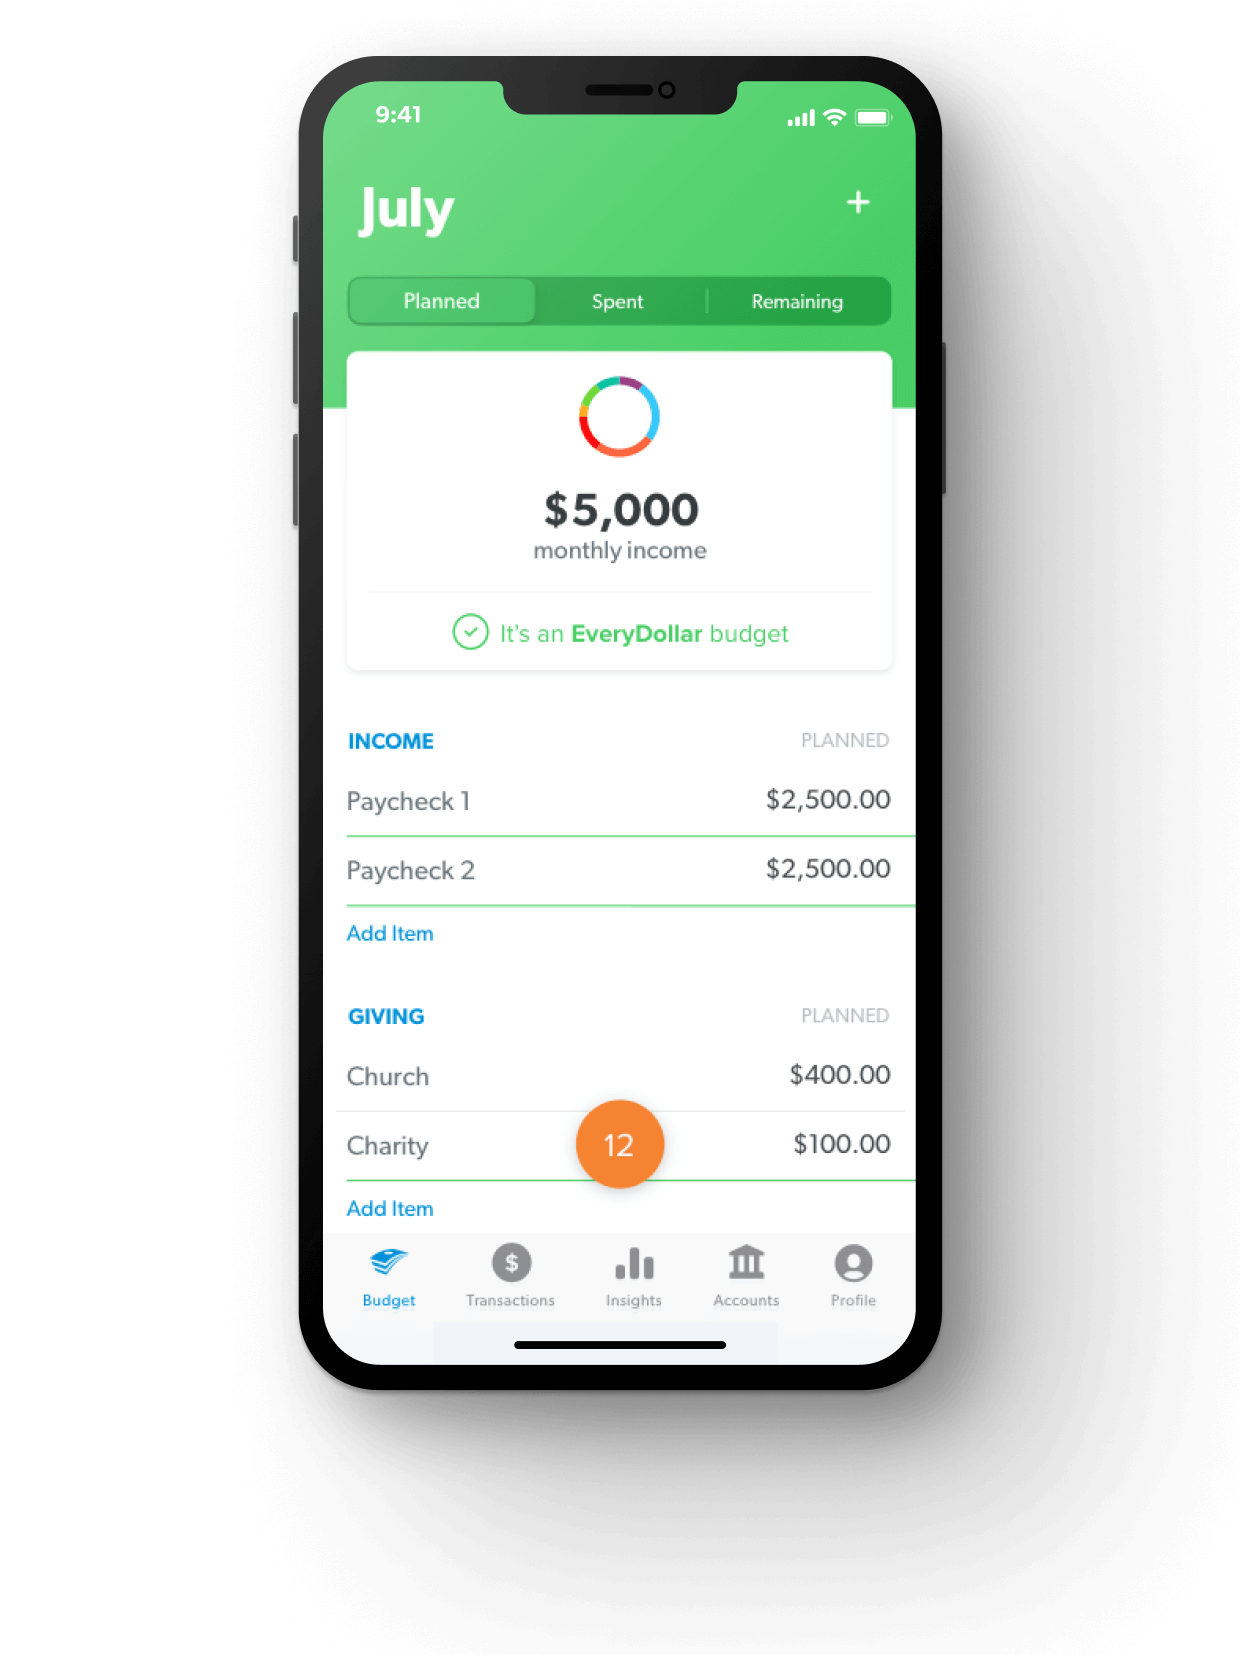 EveryDollar budgeting app on phone screen